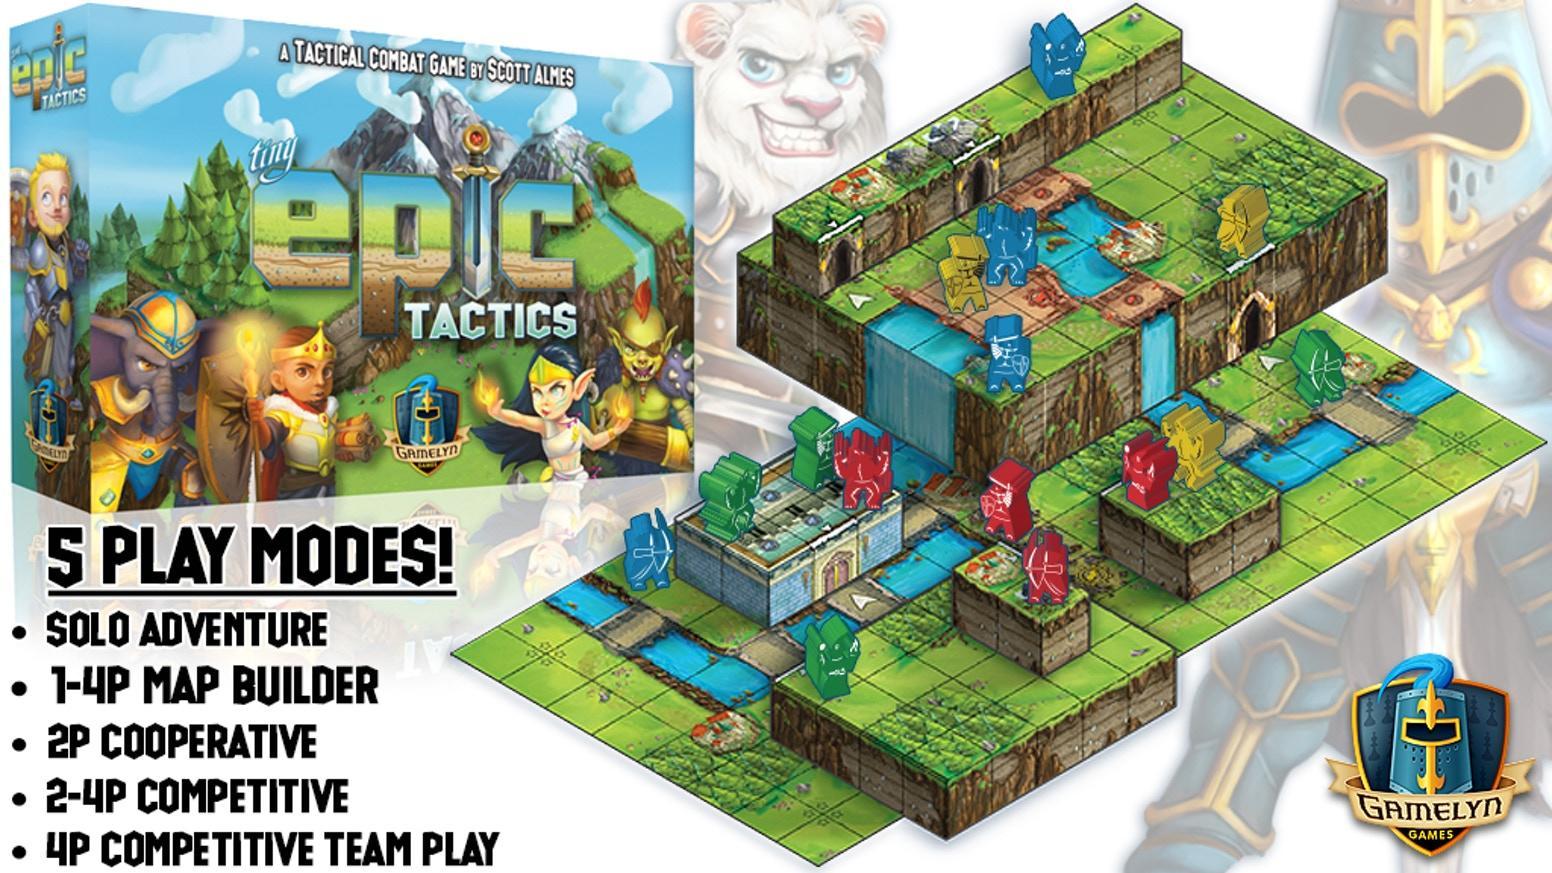 Tiny Epic Tactics Play Mat